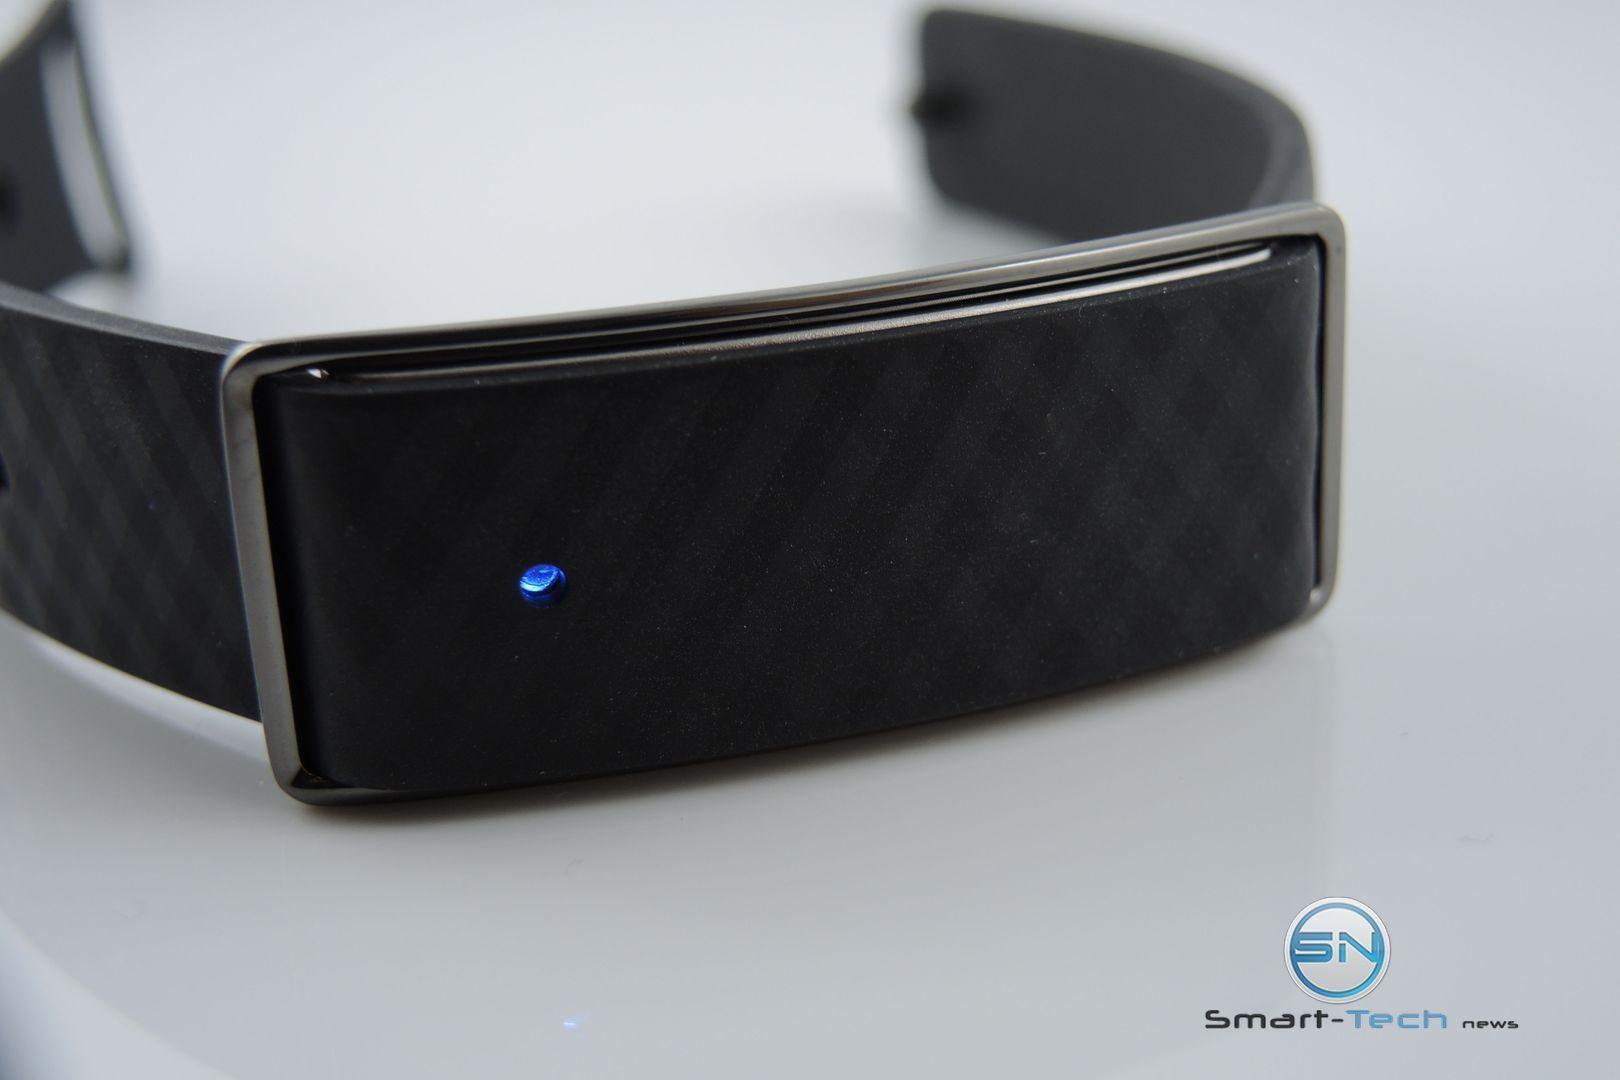 led-benachrichtigung-huawei-colorband-smarttechnews